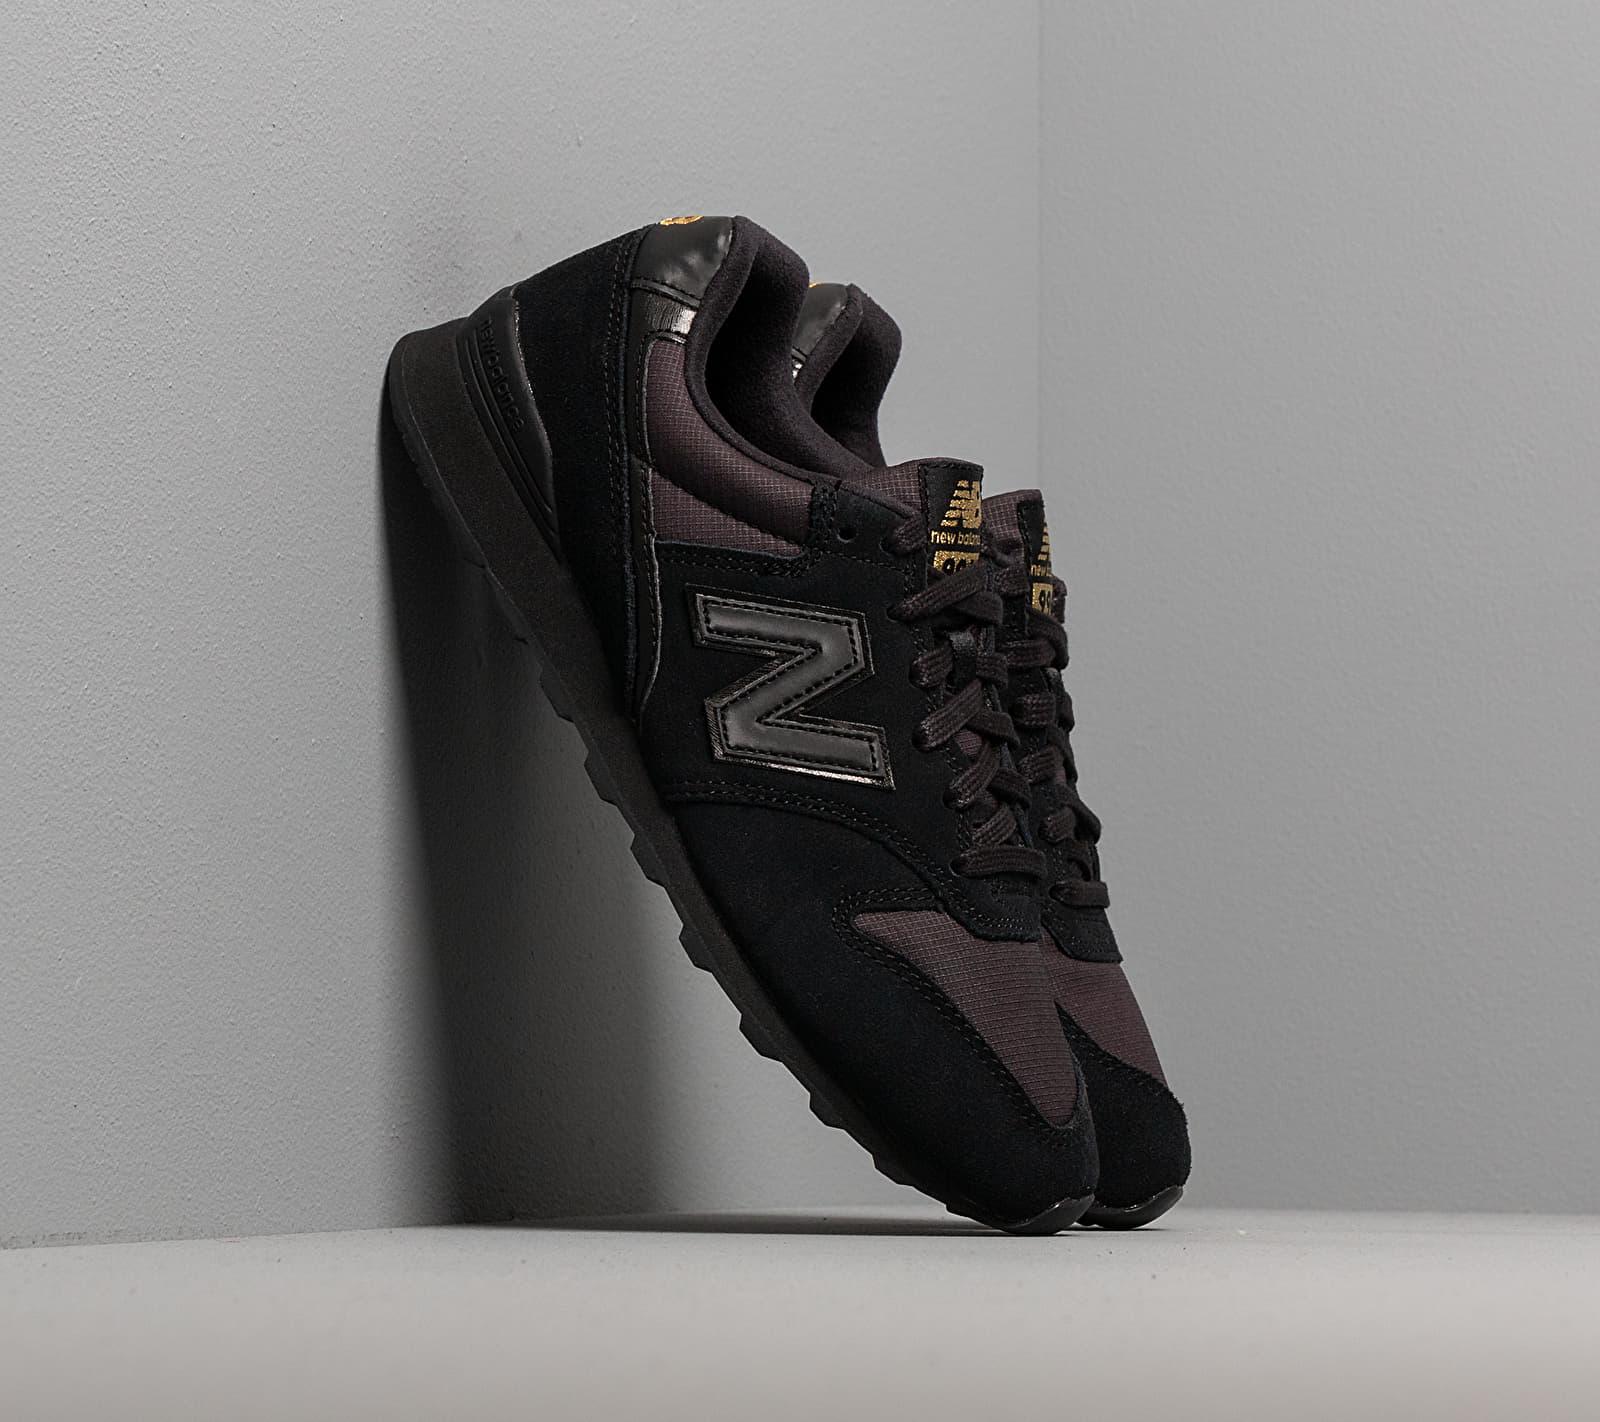 New Balance 996 Black EUR 37.5